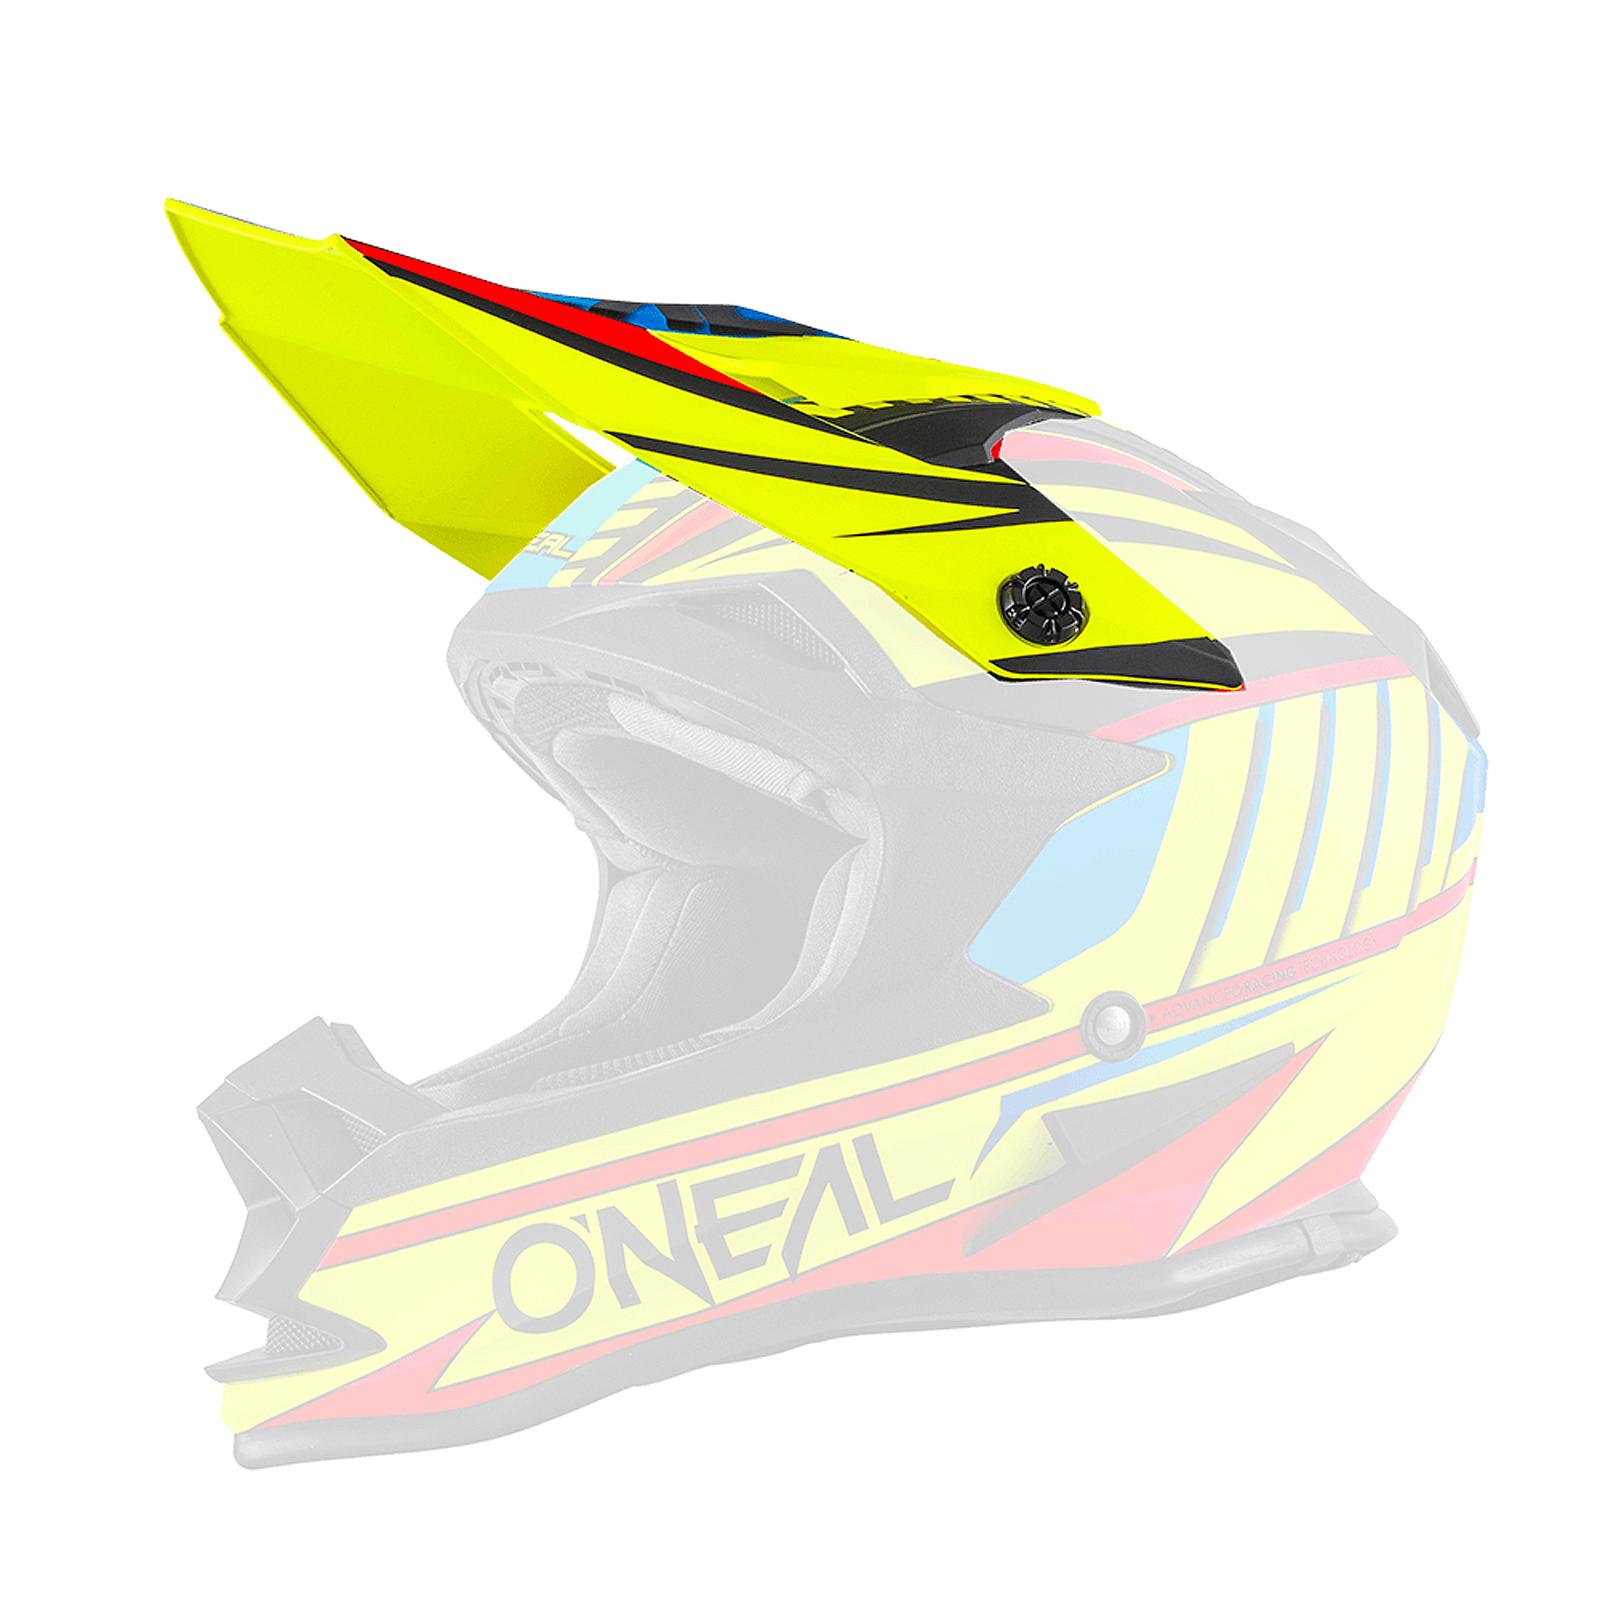 O/'neal Spare Visor 7 Series Evo Helm Visier Chaser schwarz//weiß Oneal